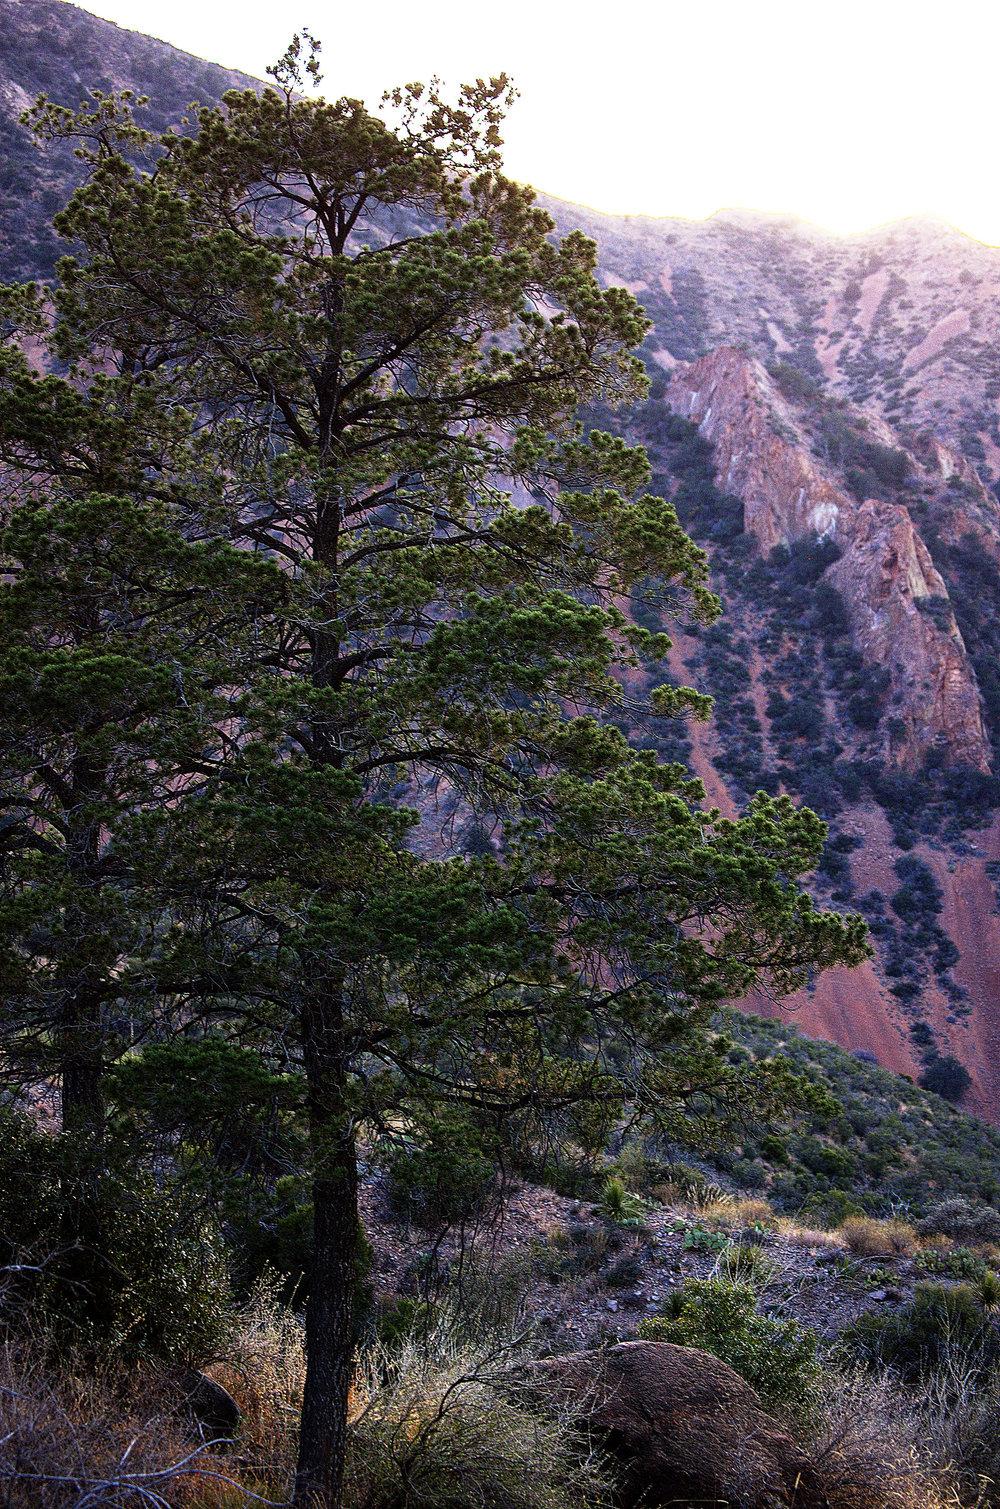 Pinus ponderosa, Ponderosa Pine